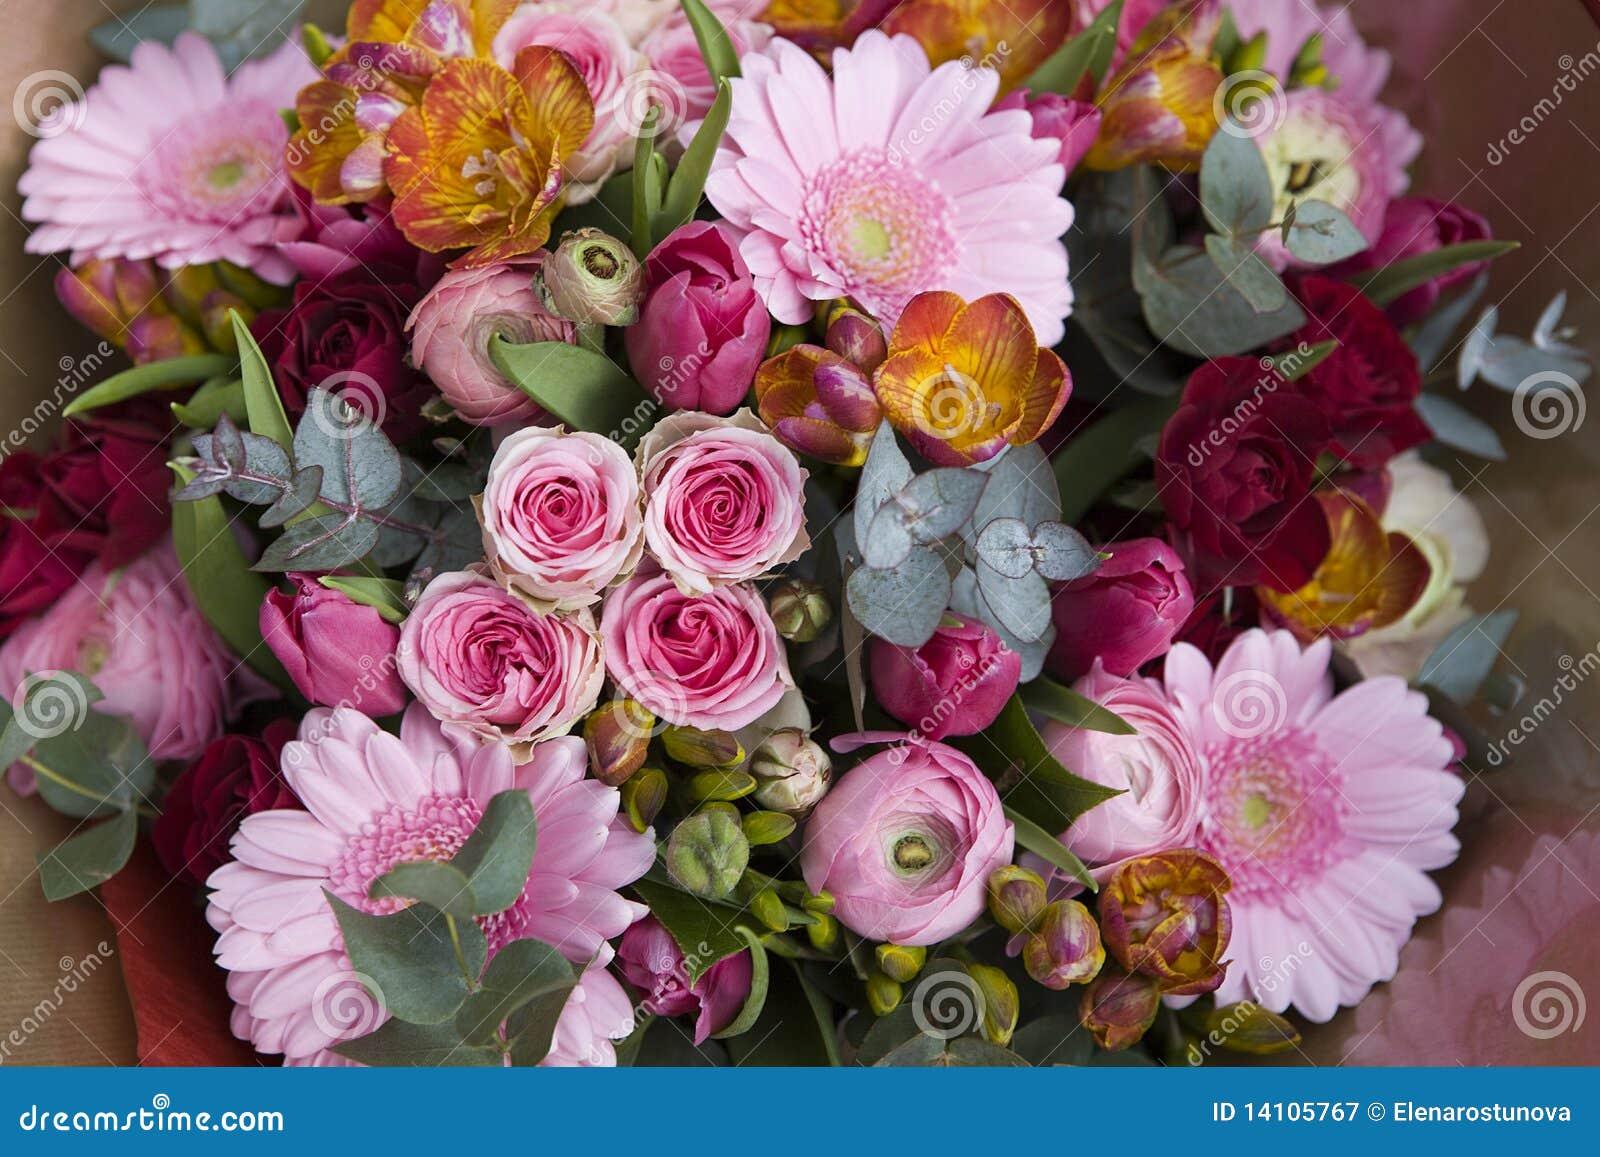 Colorful Variety Of Flowers Stock Image Image Of Celebration